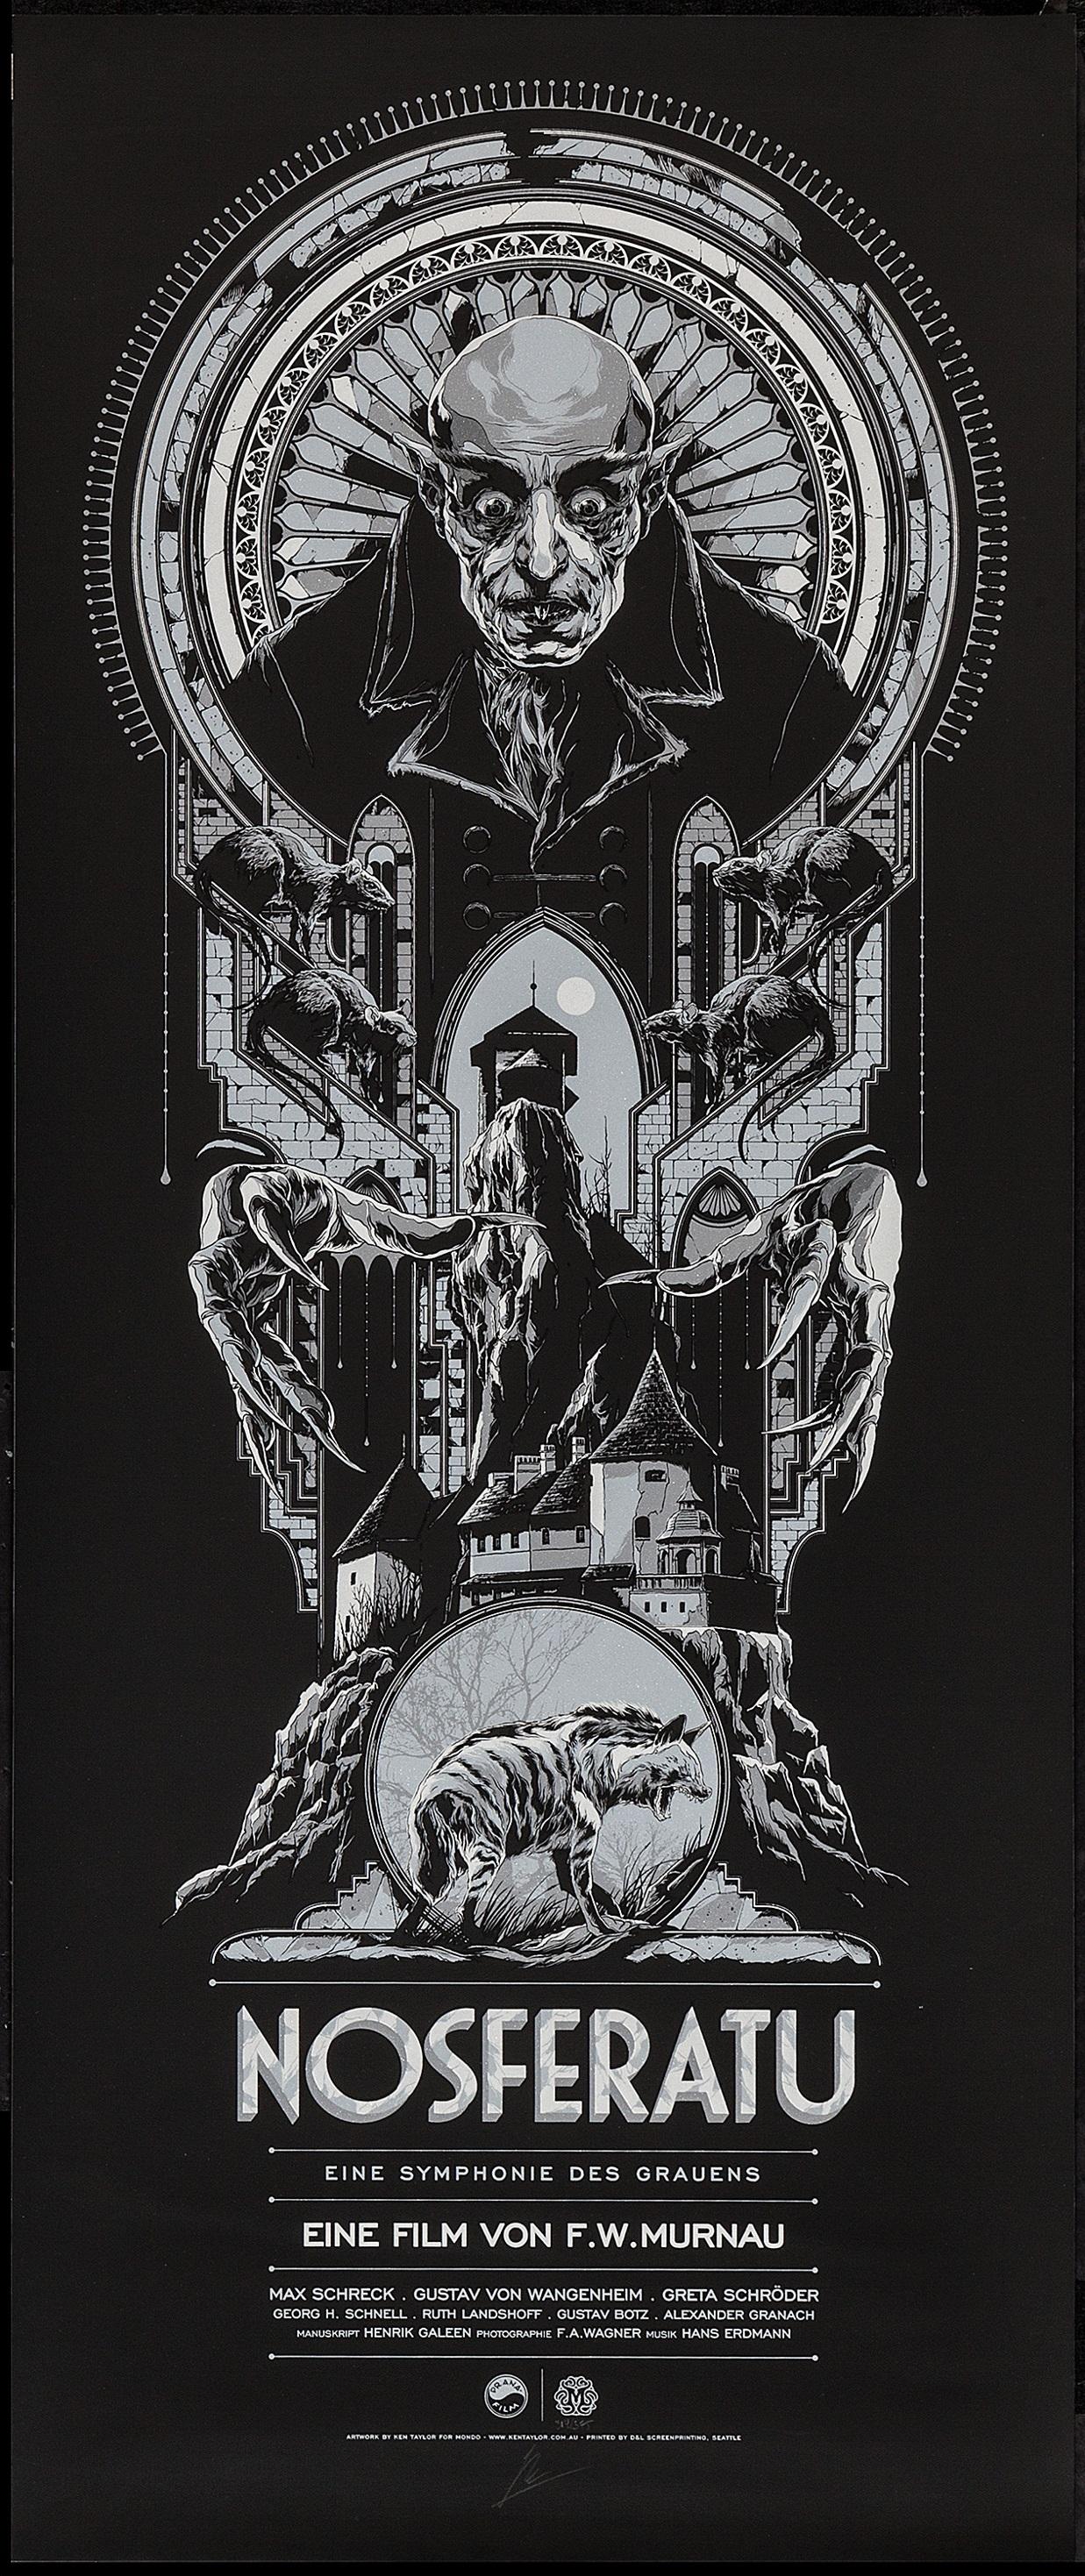 Nosferatu (1922) poster by Ken Taylor, 2014